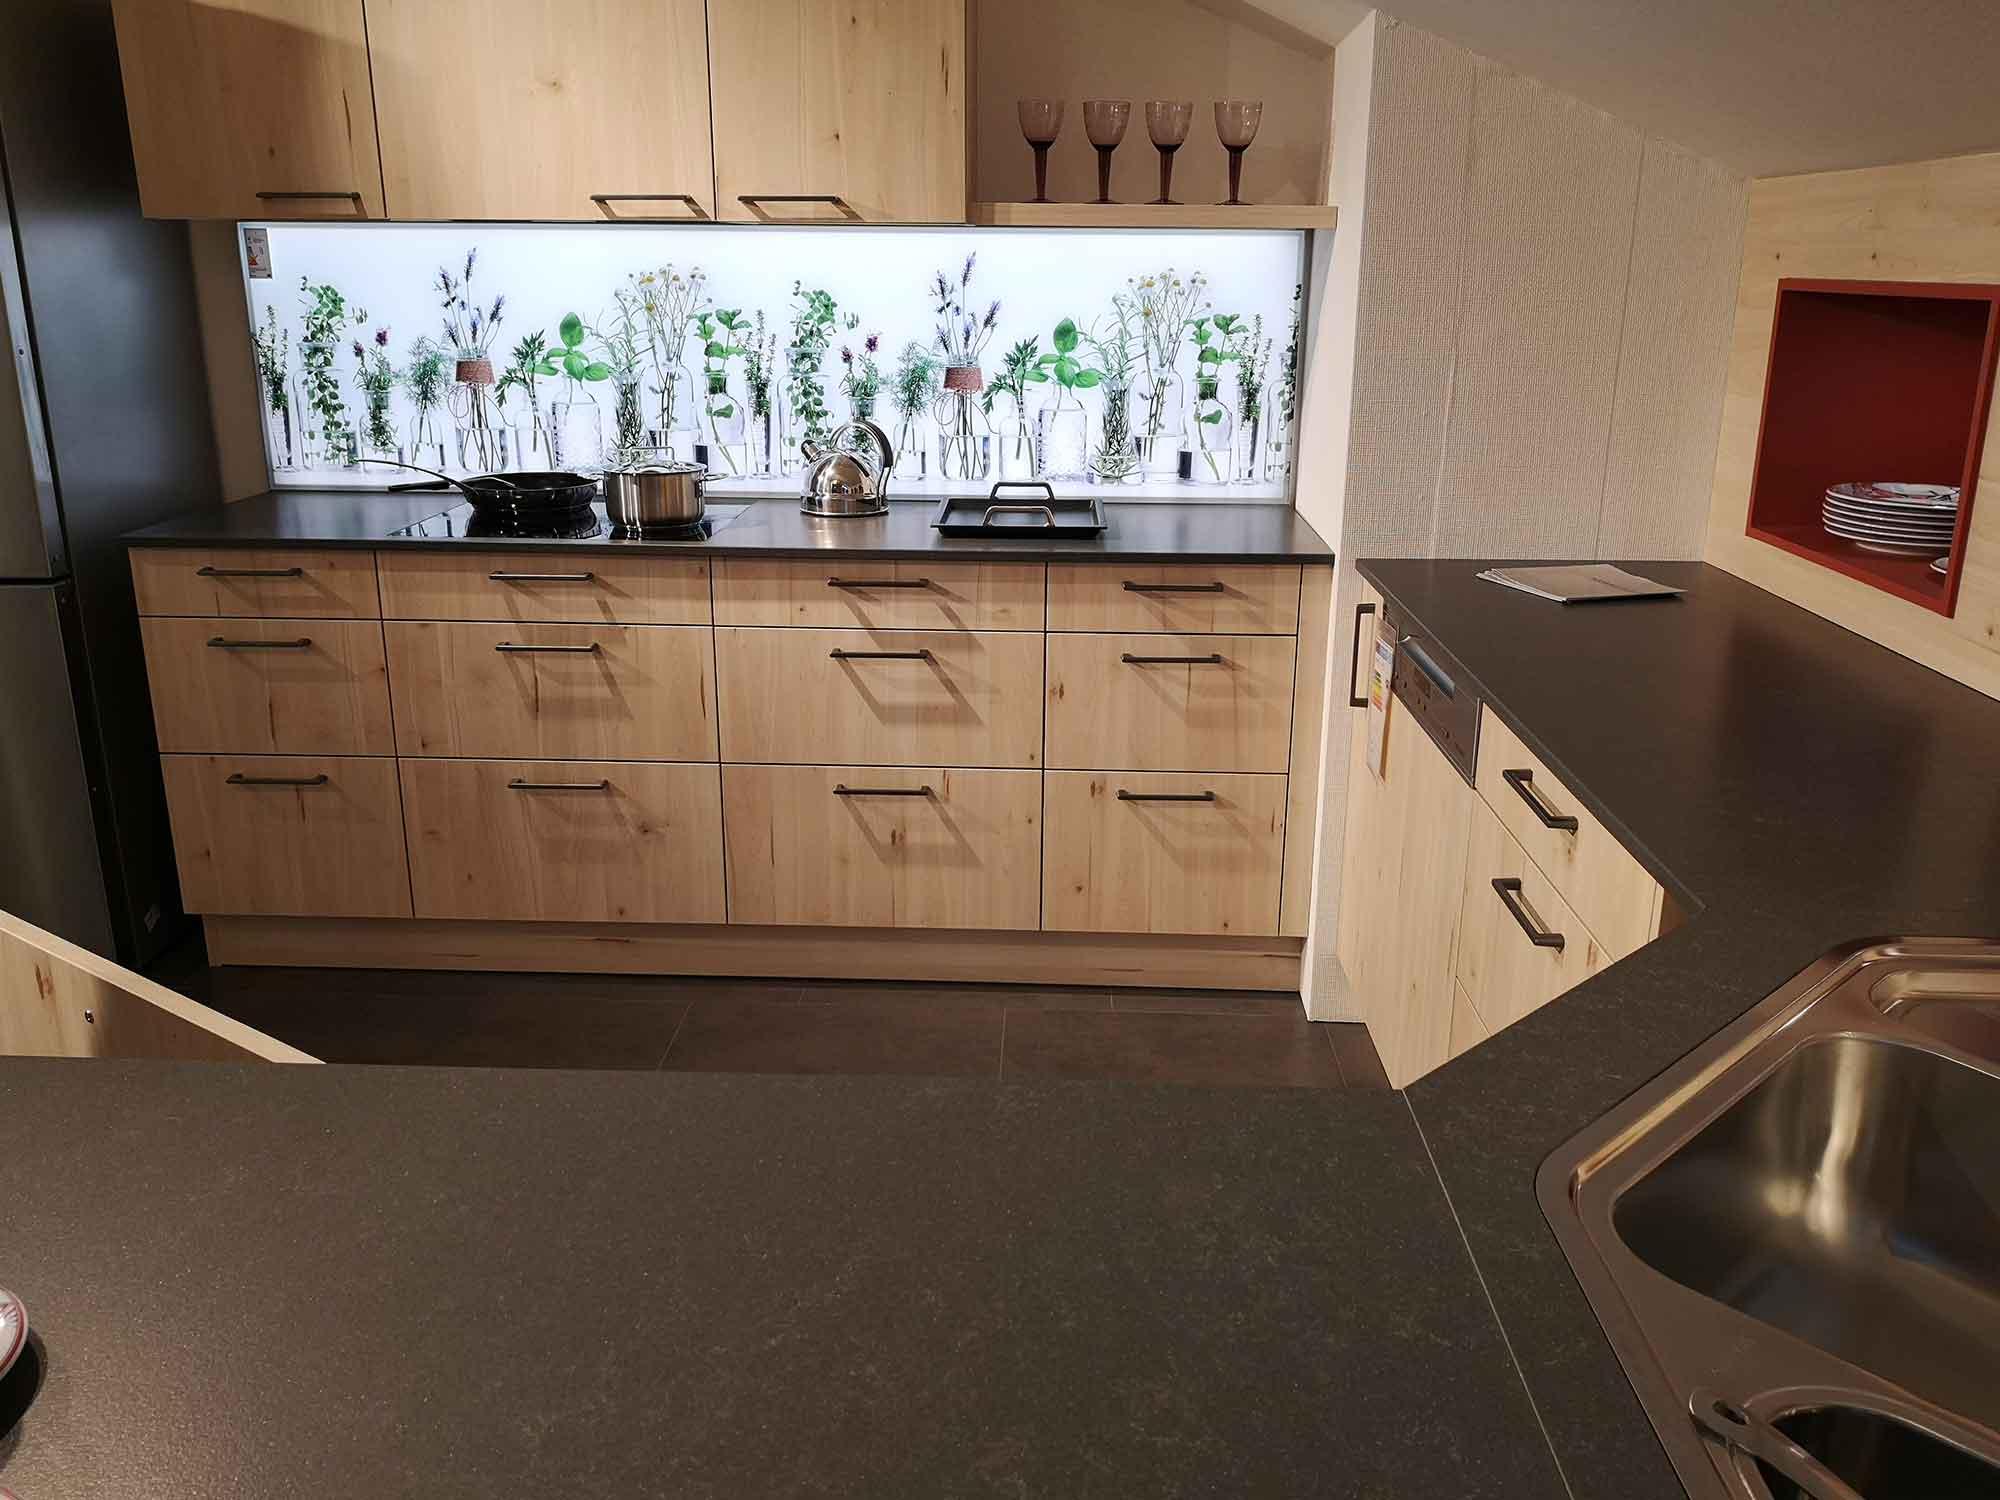 basic quarz beton grey arbeitsplatte arbeitsplatten k chenarbeitsplatten k chenarbeitsplatte. Black Bedroom Furniture Sets. Home Design Ideas